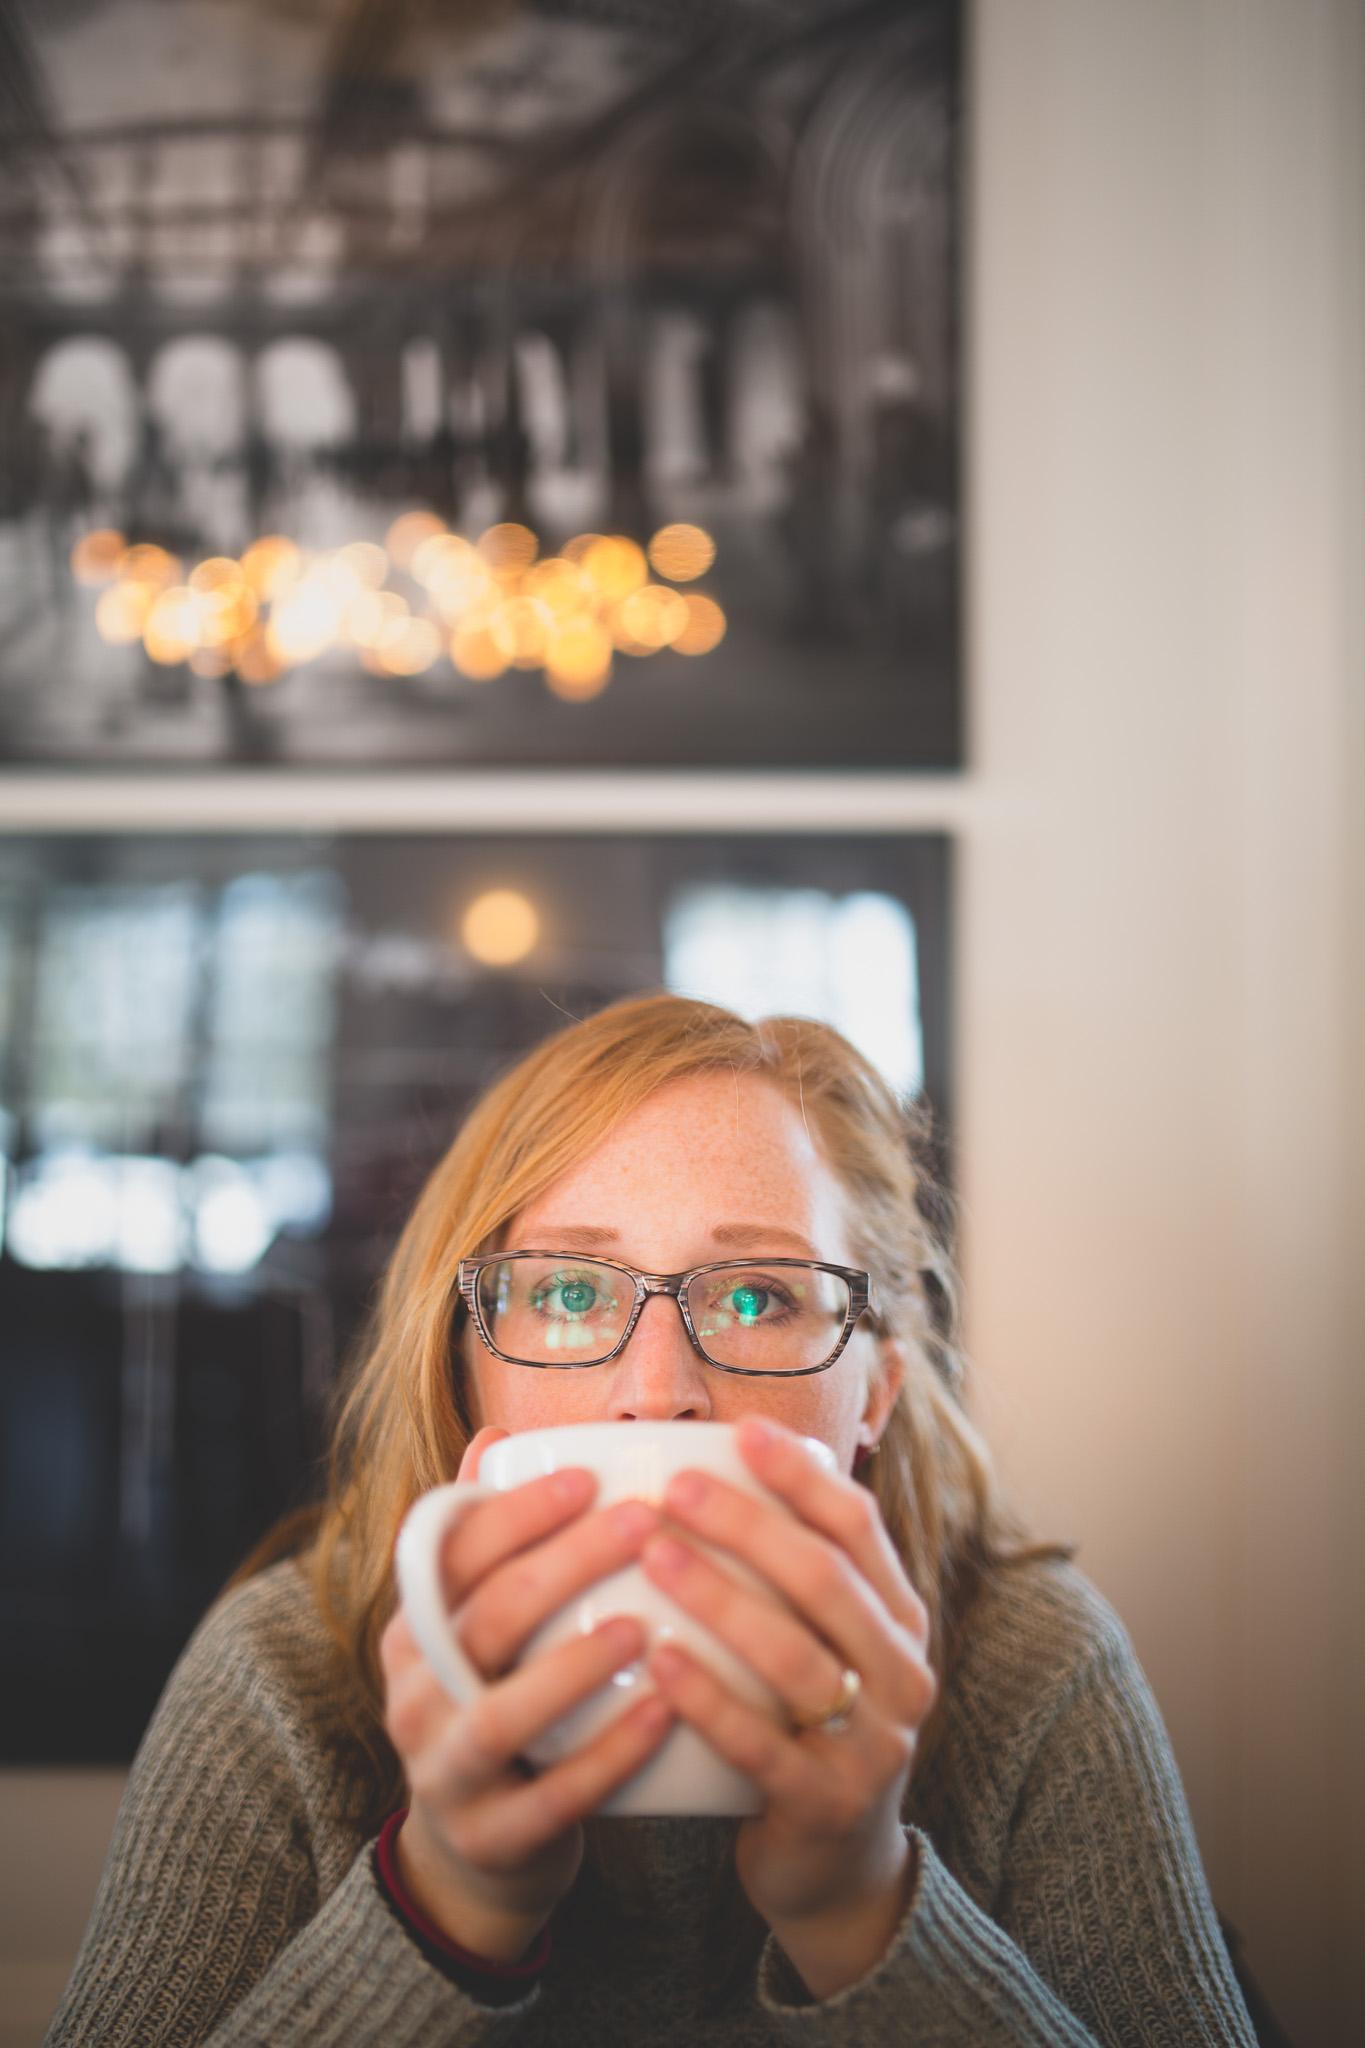 002-Jonathan-Kuhn-Photography-Alices Cafe Carp ON-2257.jpg